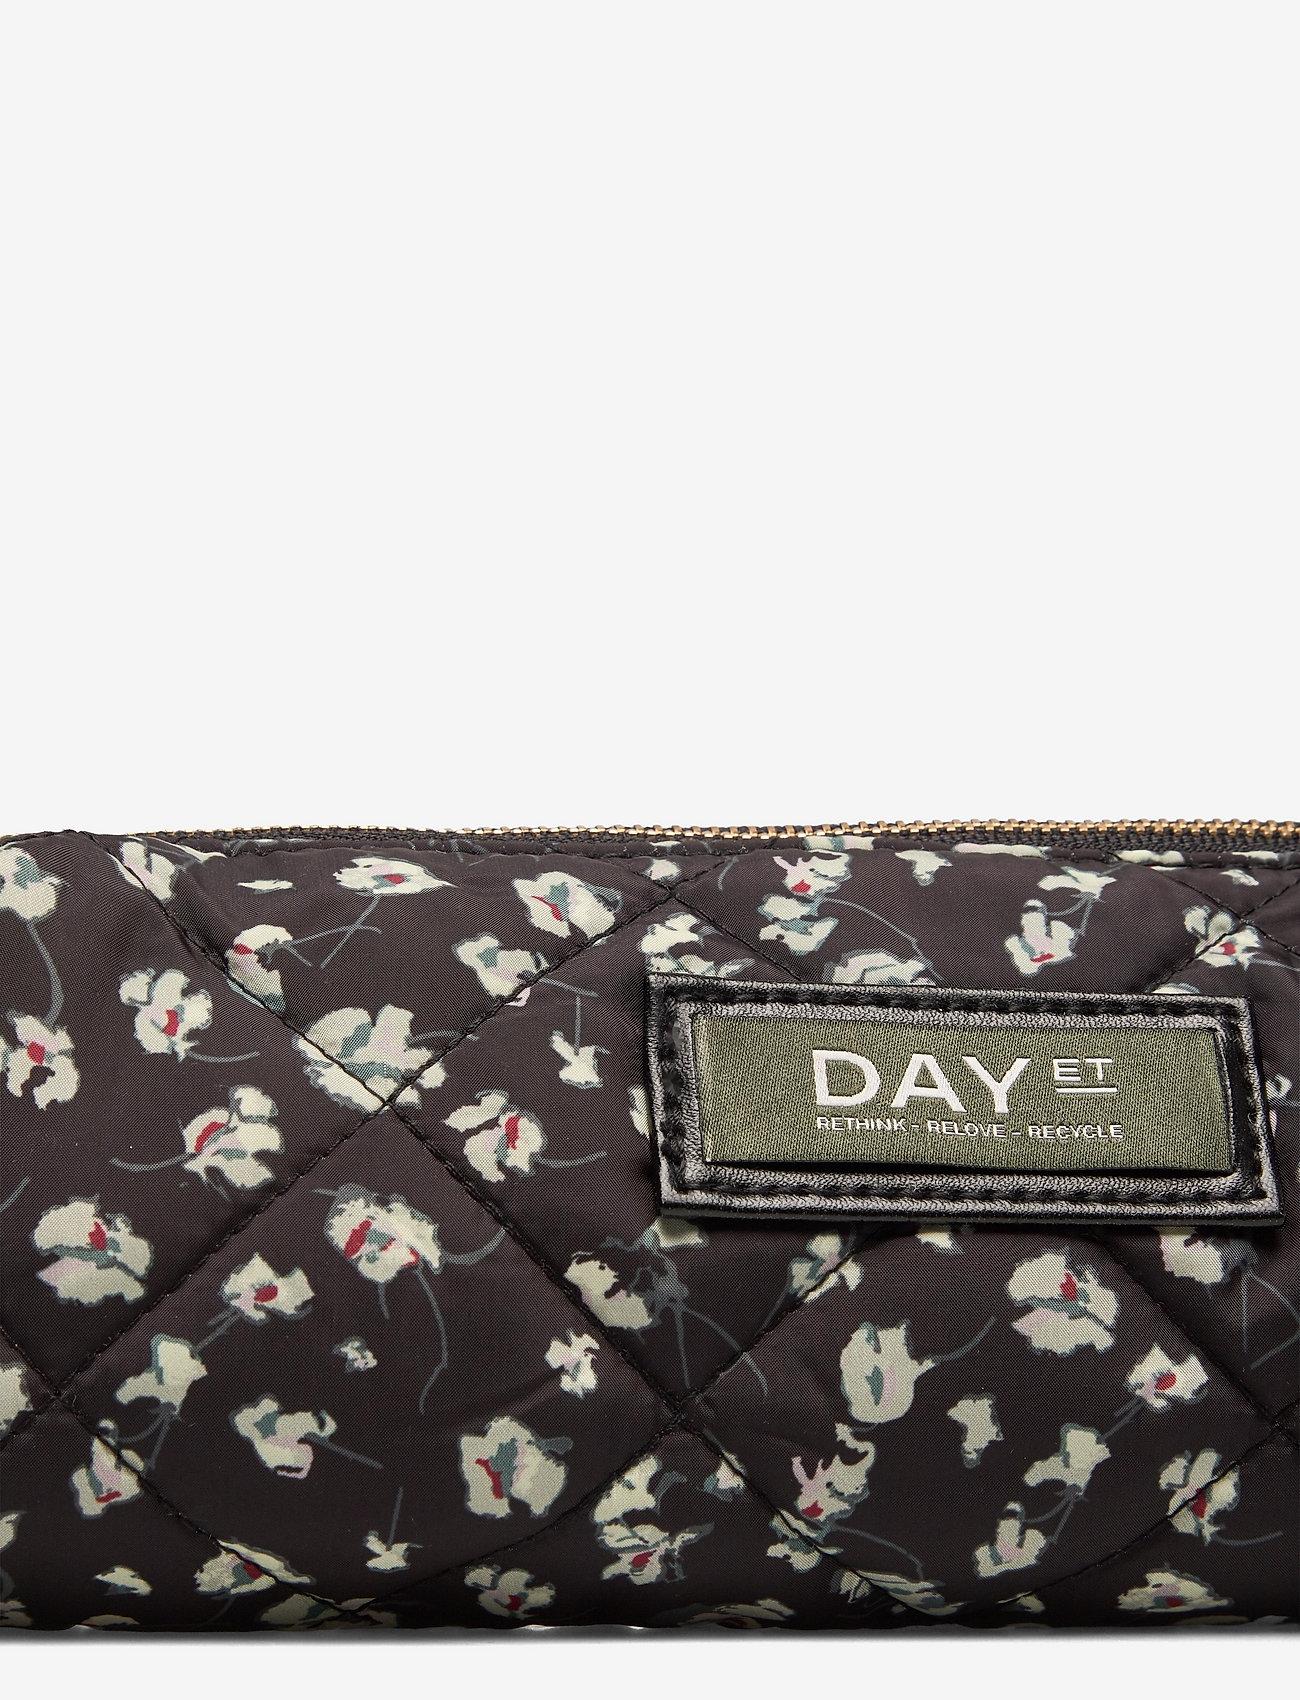 DAY et - Day Gweneth RE-Q Flower Pencil - accessories - black - 3